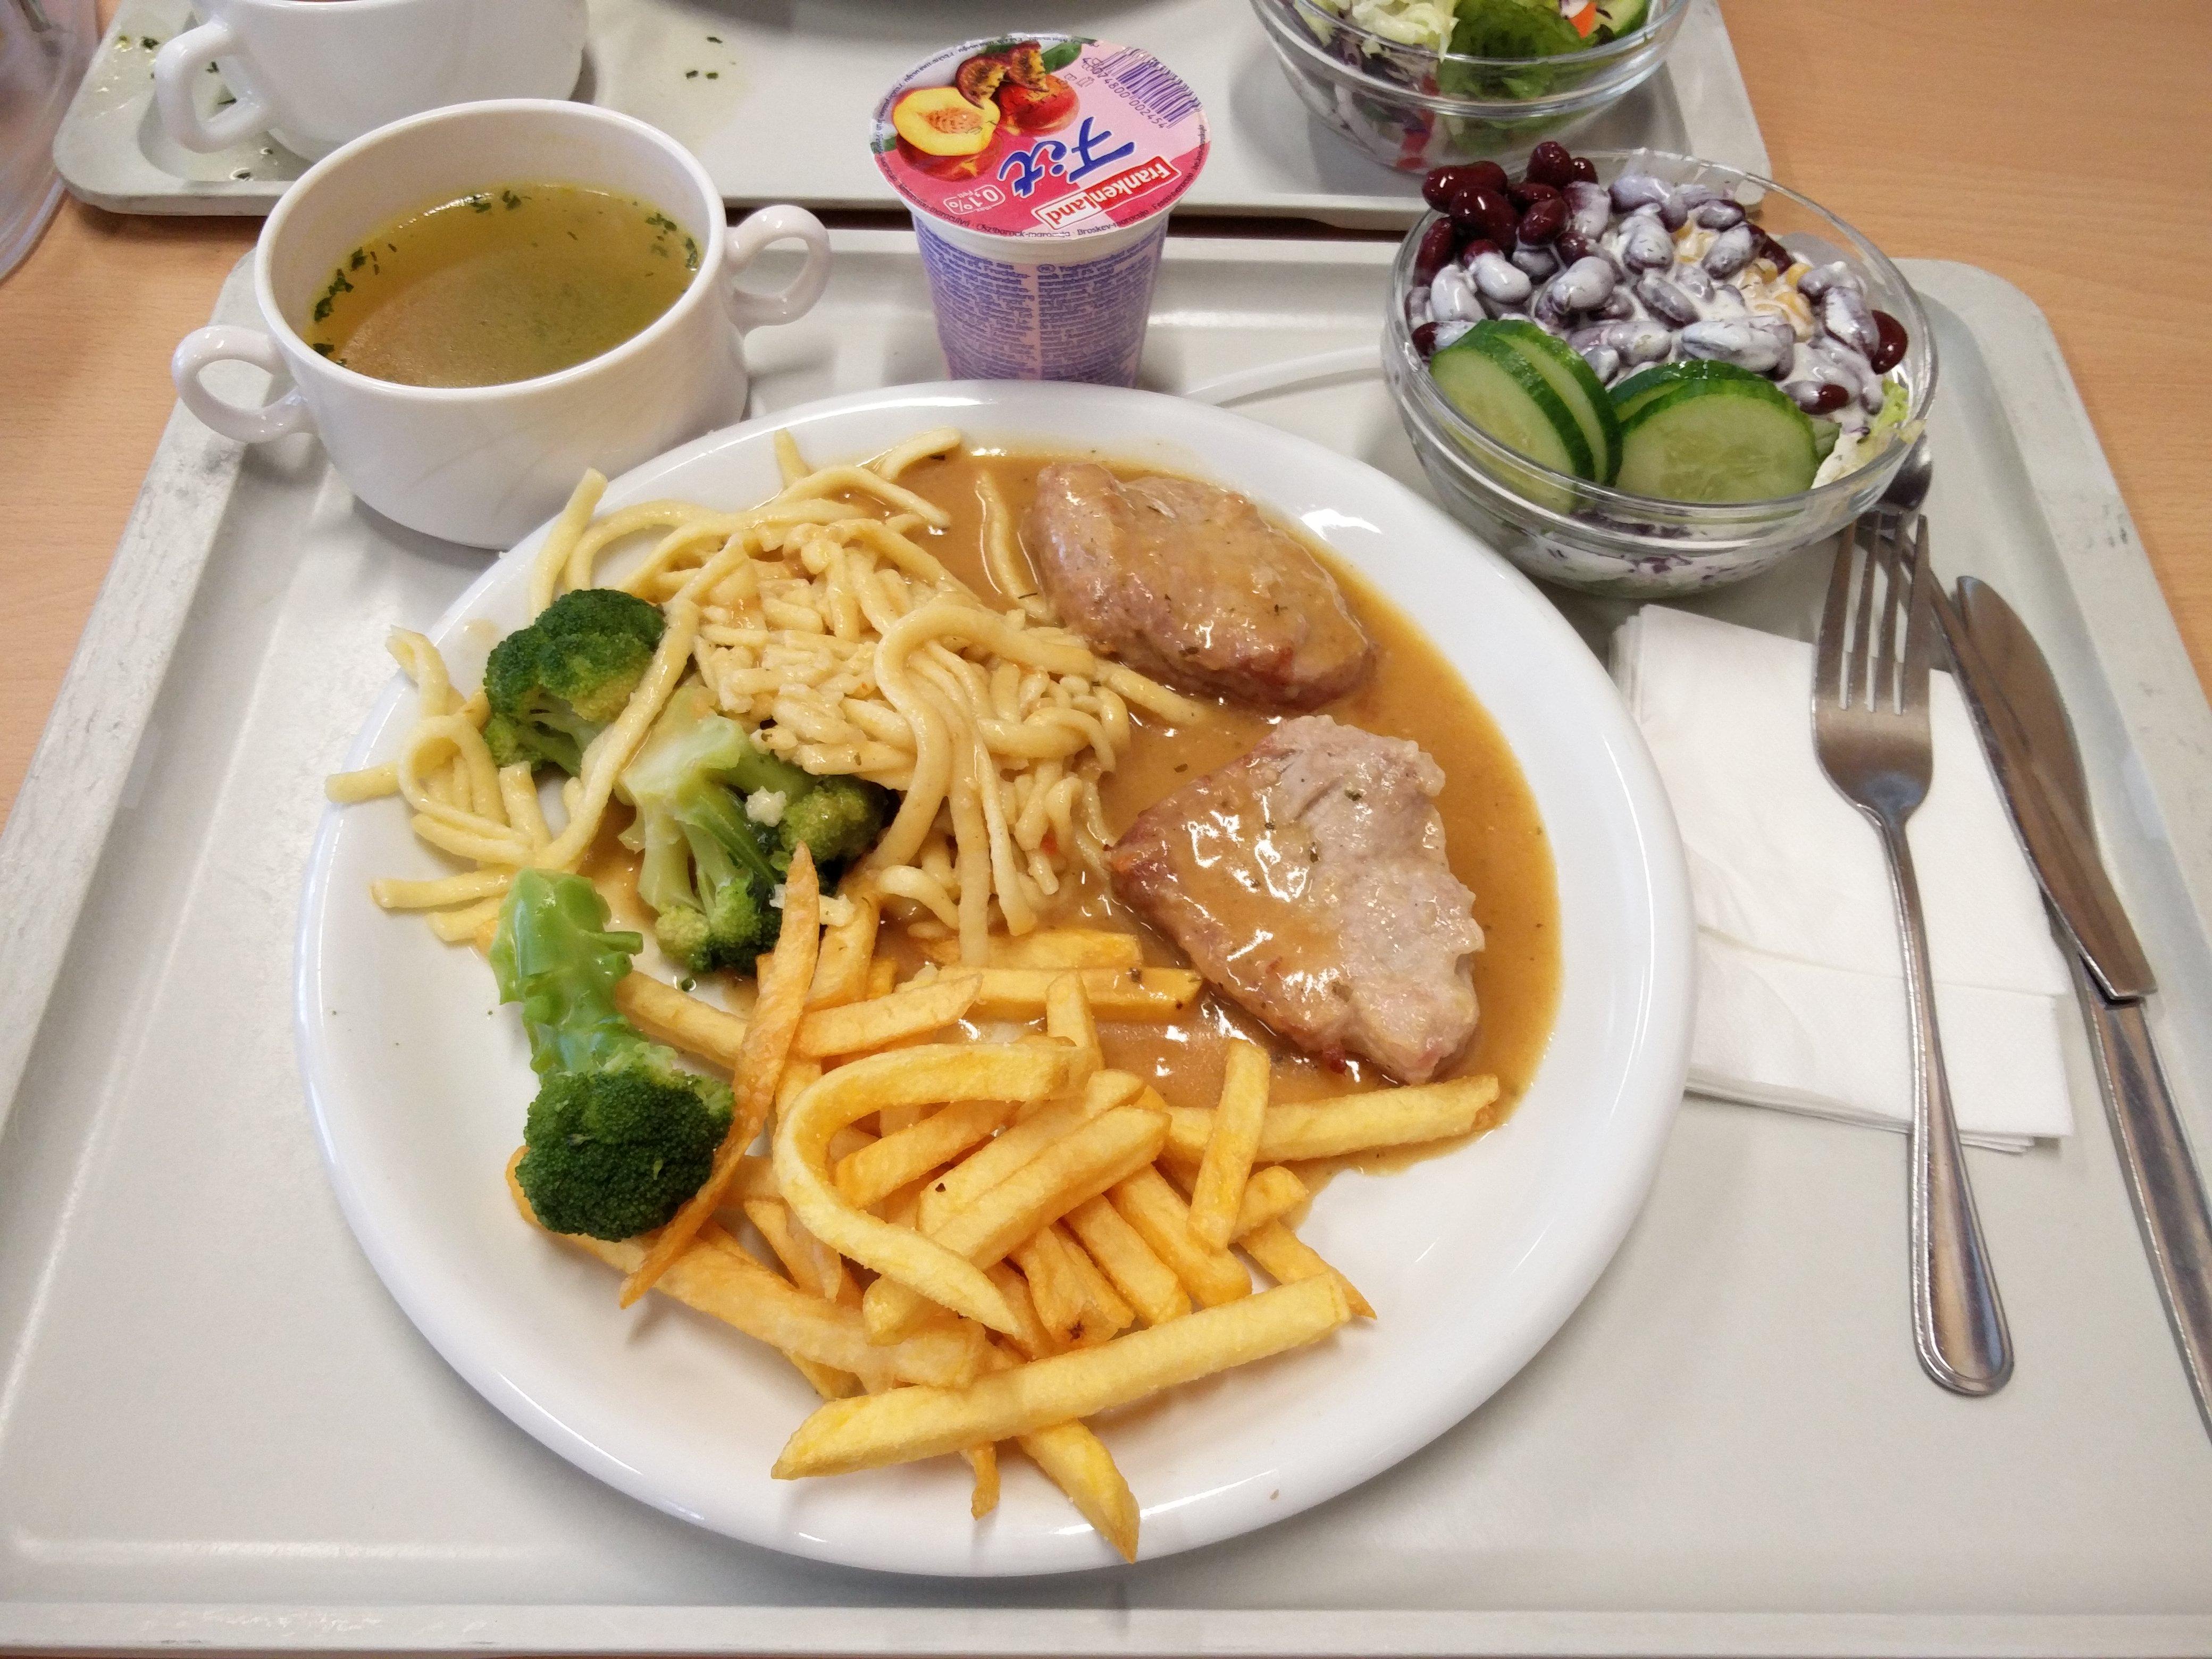 https://foodloader.net/nico_2016-06-23_schweinefilet-spaetzle-pommes-brokkoli-suppe-salat-joghurt.jpg